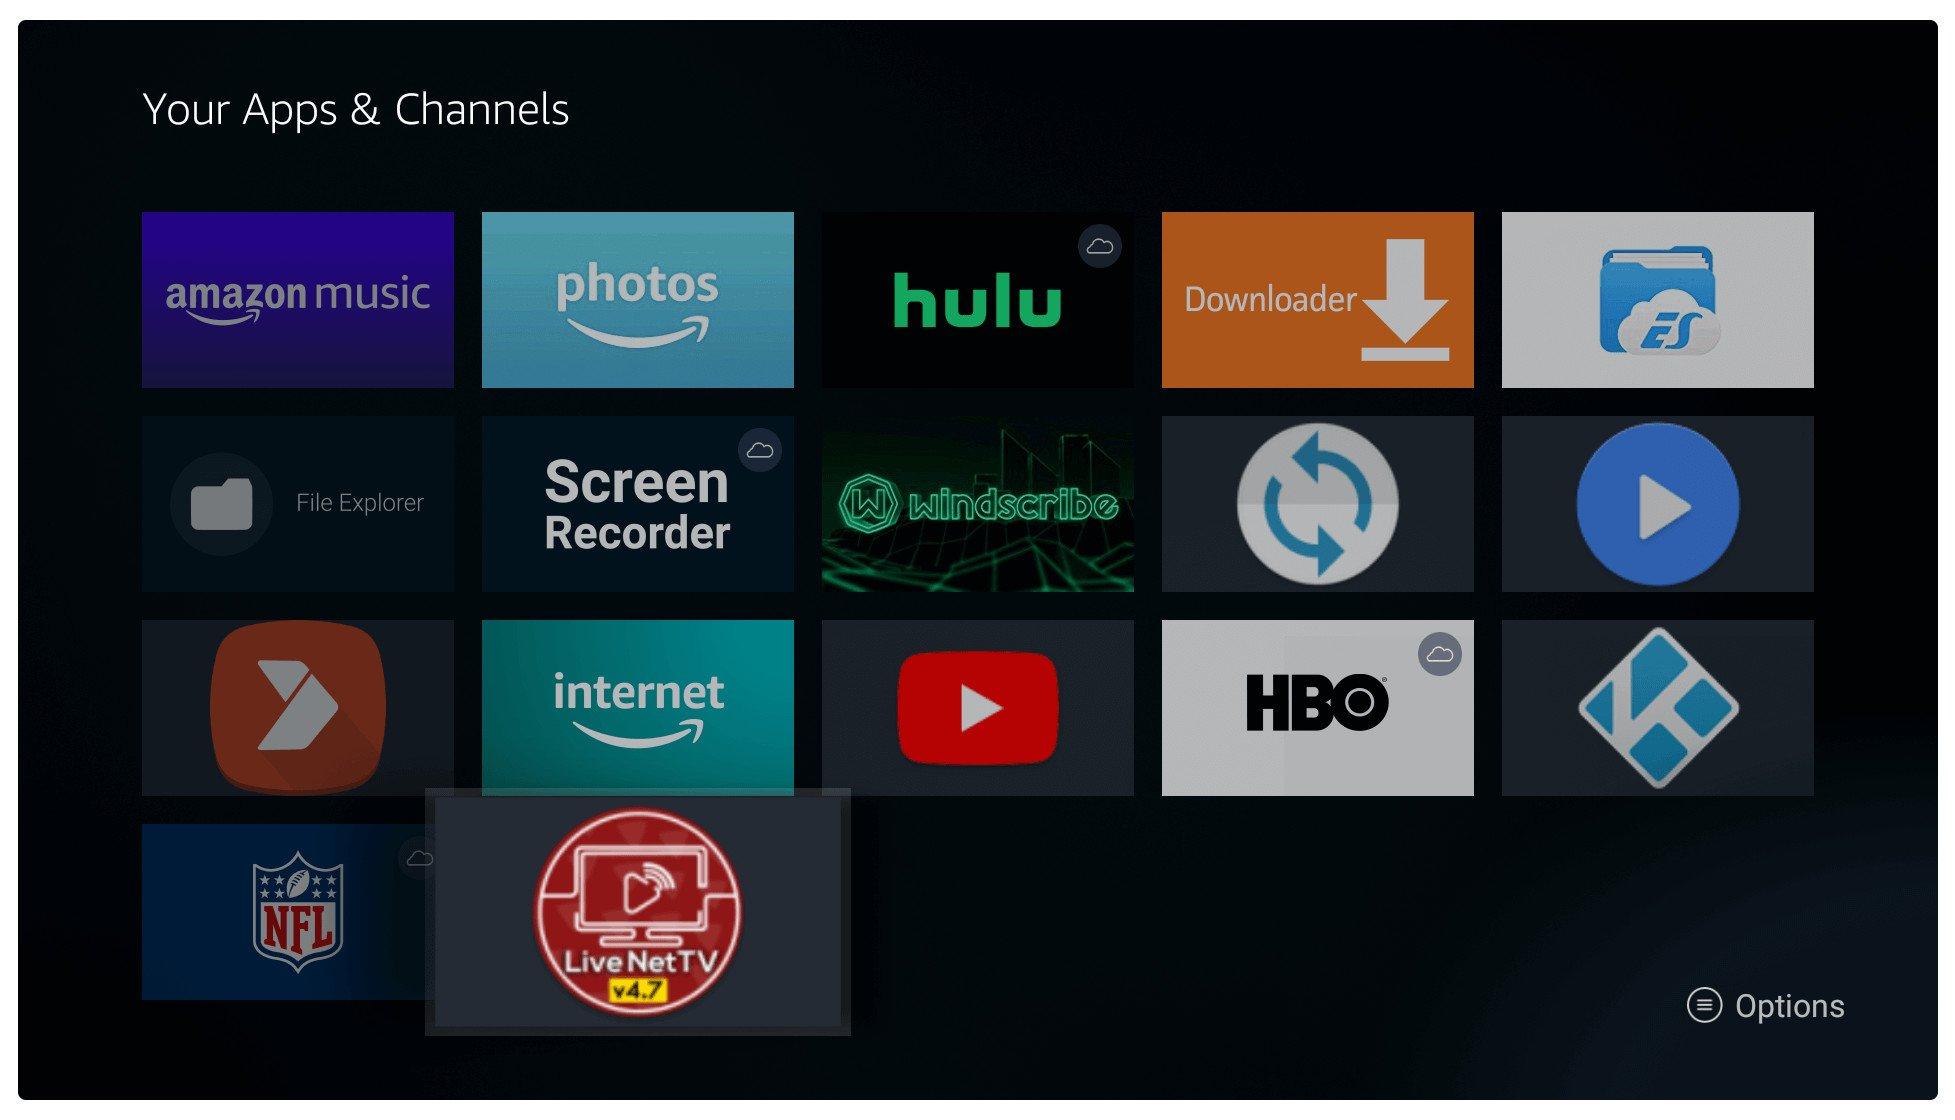 Watch-Free-Live-NFL-Football-on-Amazon-Firestick